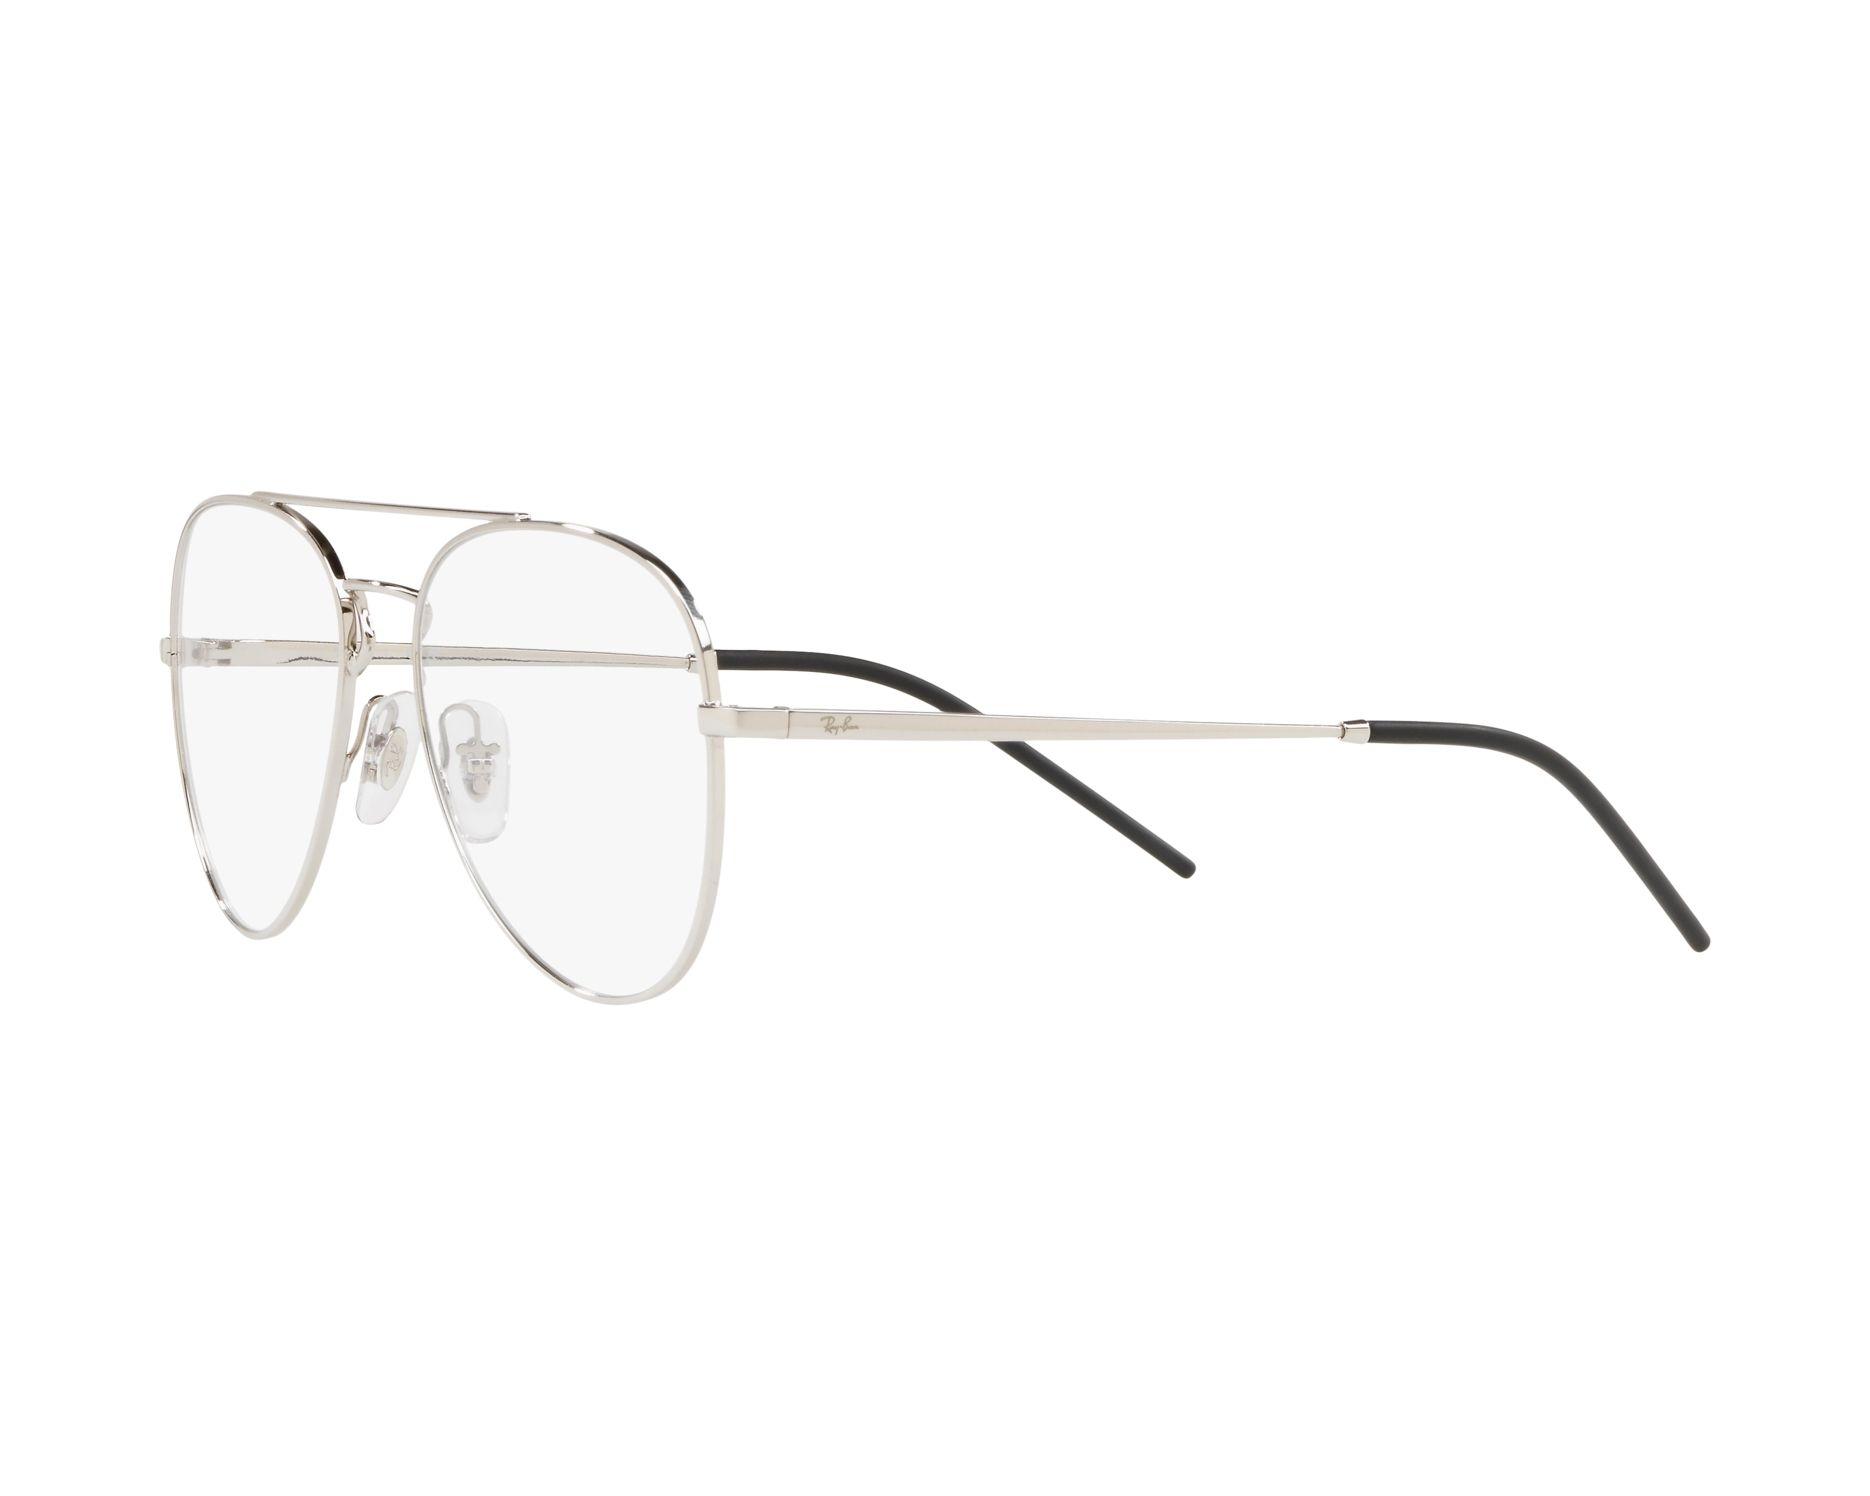 1e4e24c99b2 eyeglasses Ray-Ban RX-6413 2501 54-17 Silver 360 degree view 3